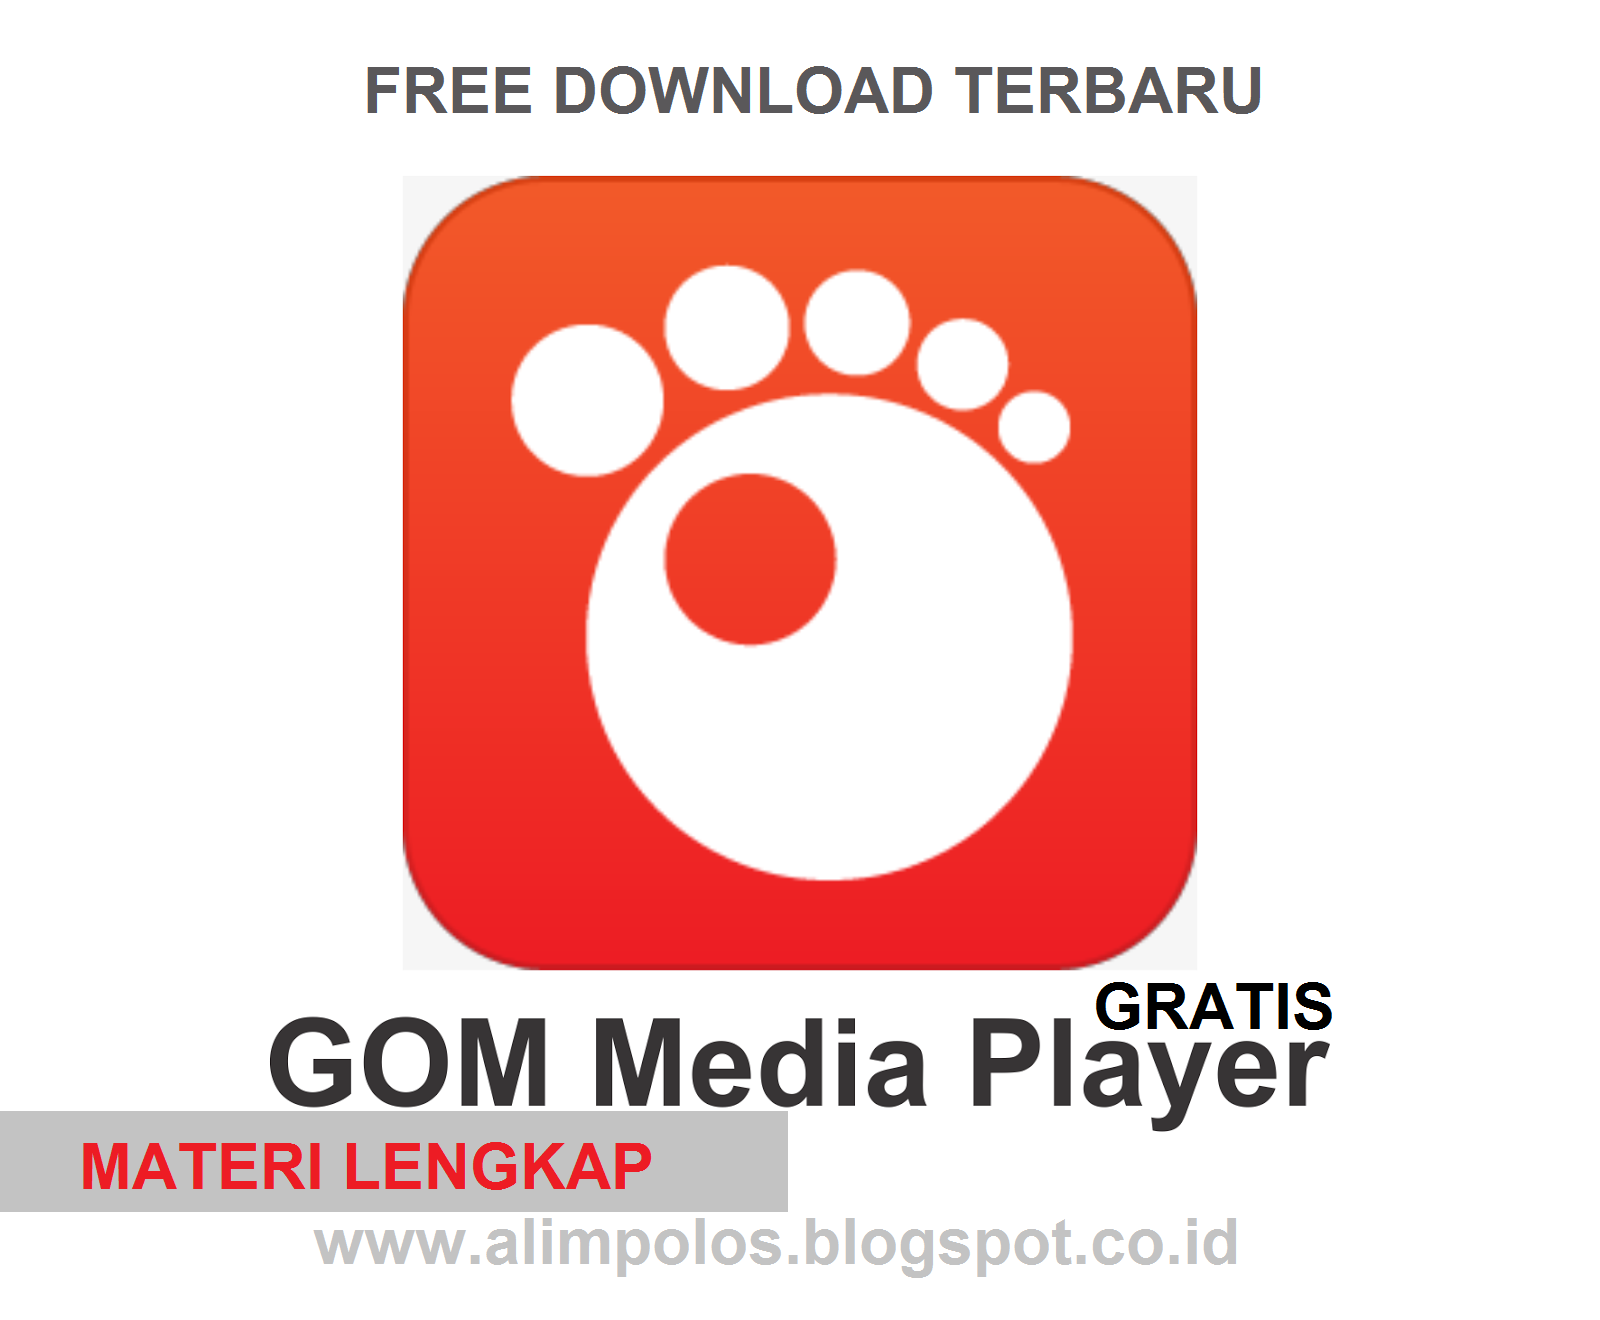 free download gom player terbaru